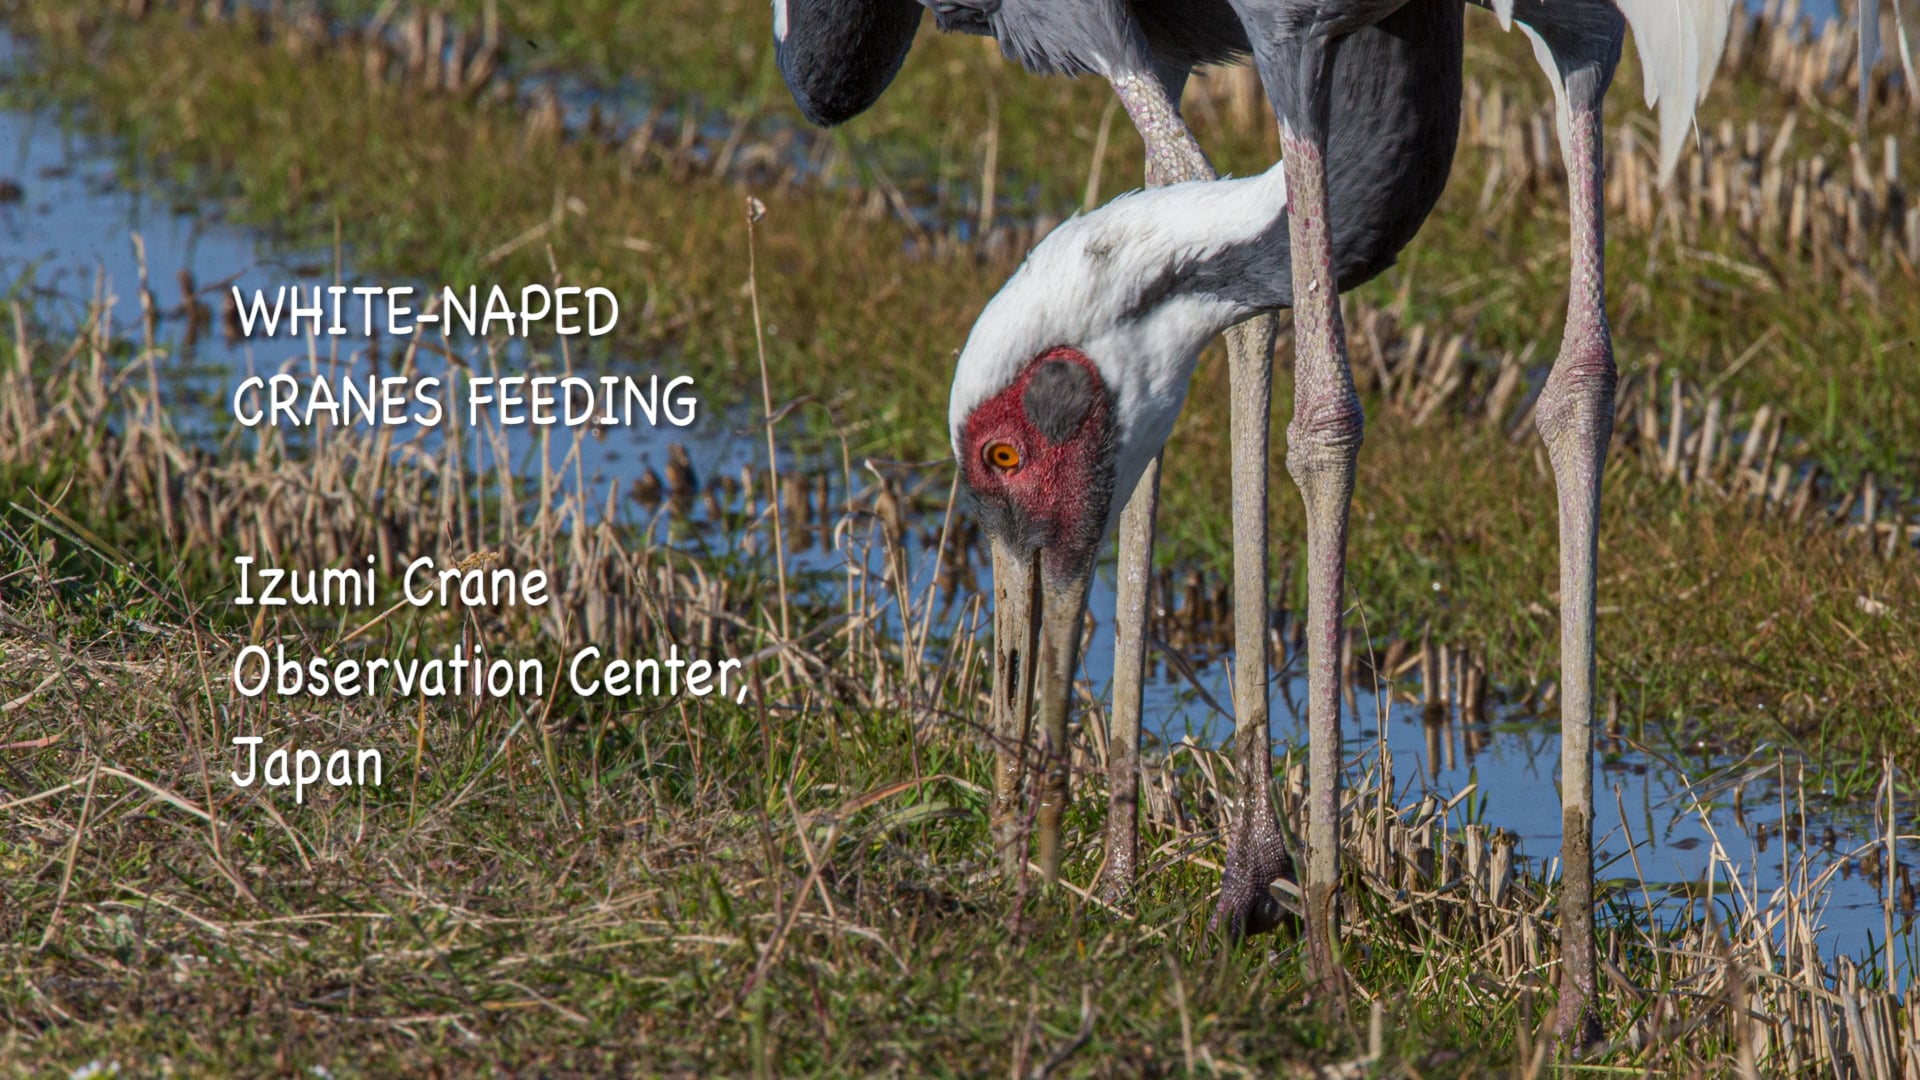 Izumi Cranes Feeding